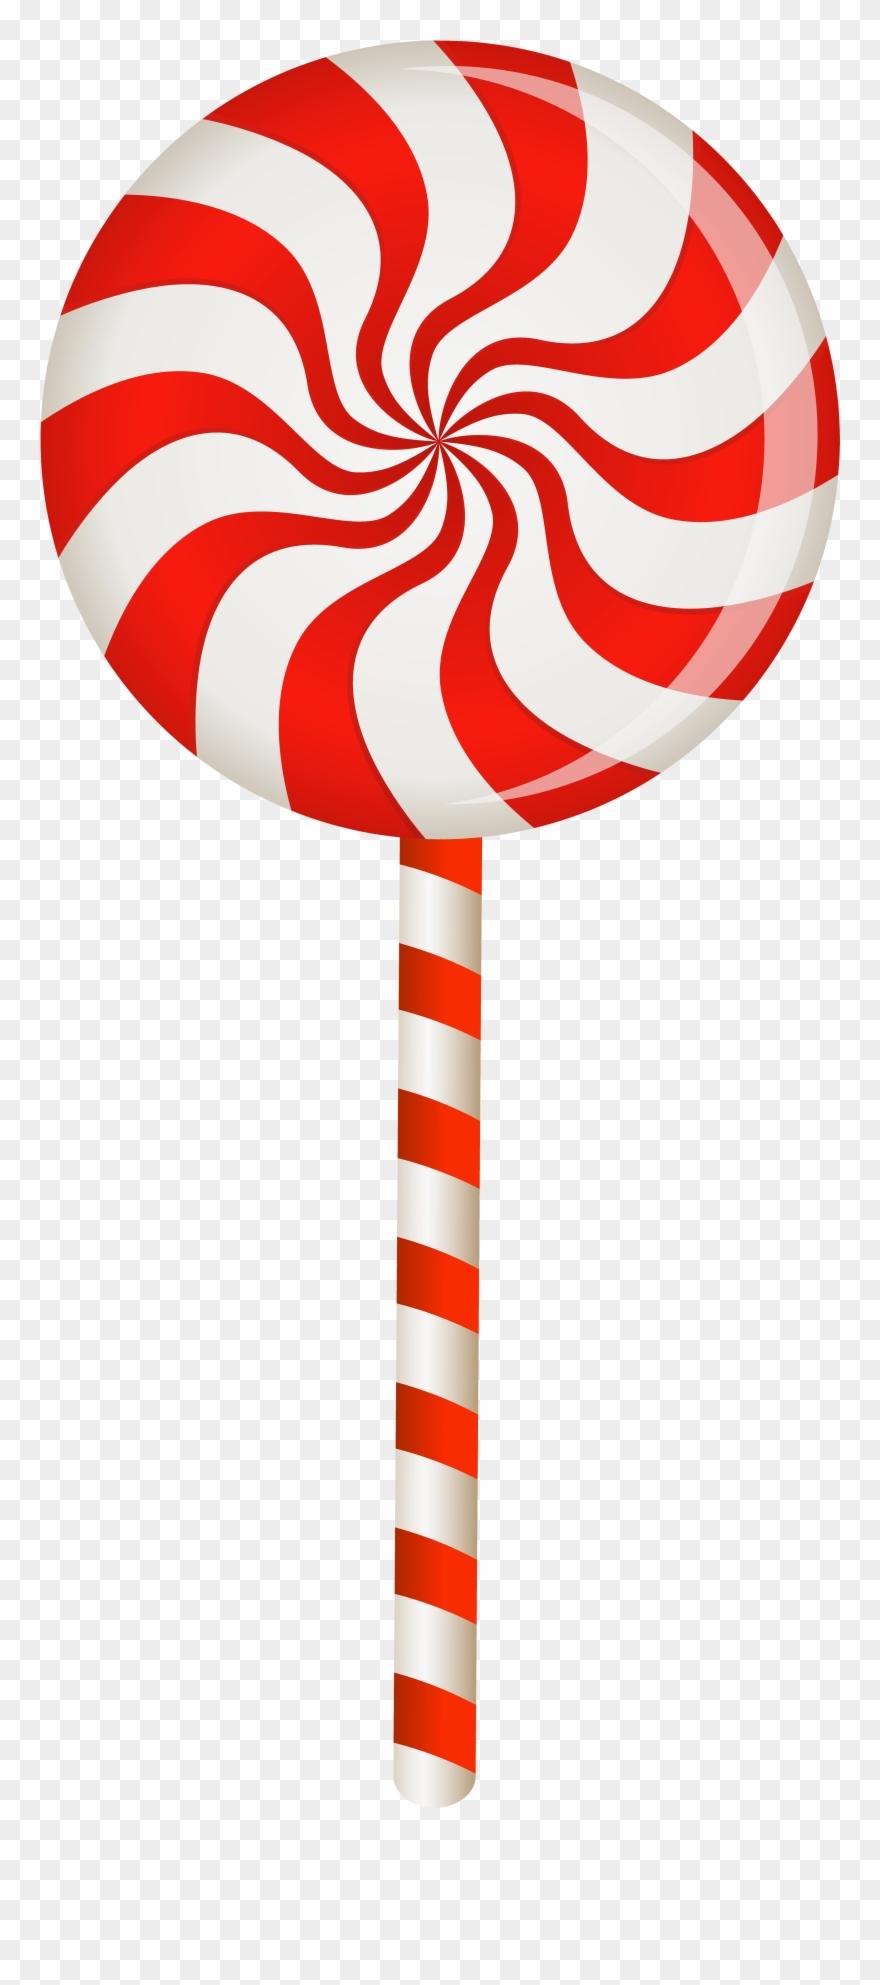 hight resolution of transparent background lollipop clipart png download